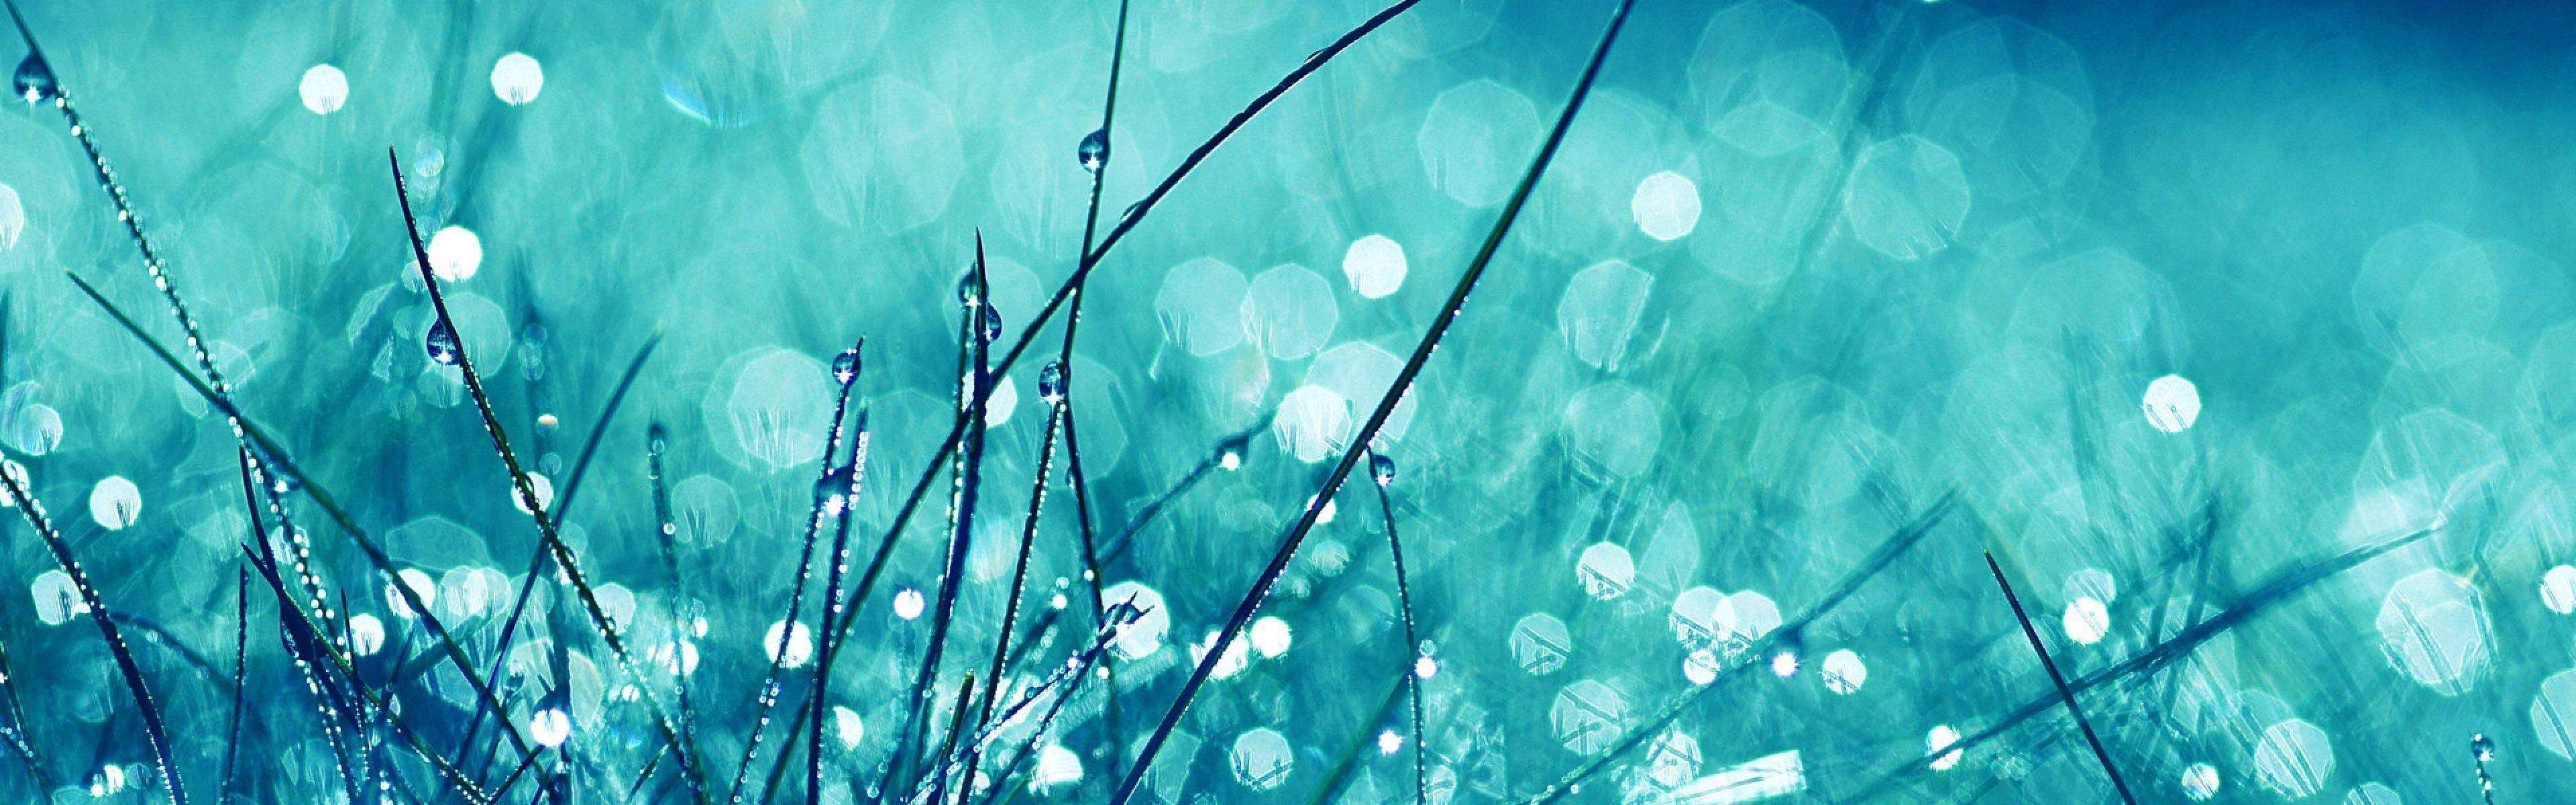 Wallpaper grass, glare, glitter, light, bright